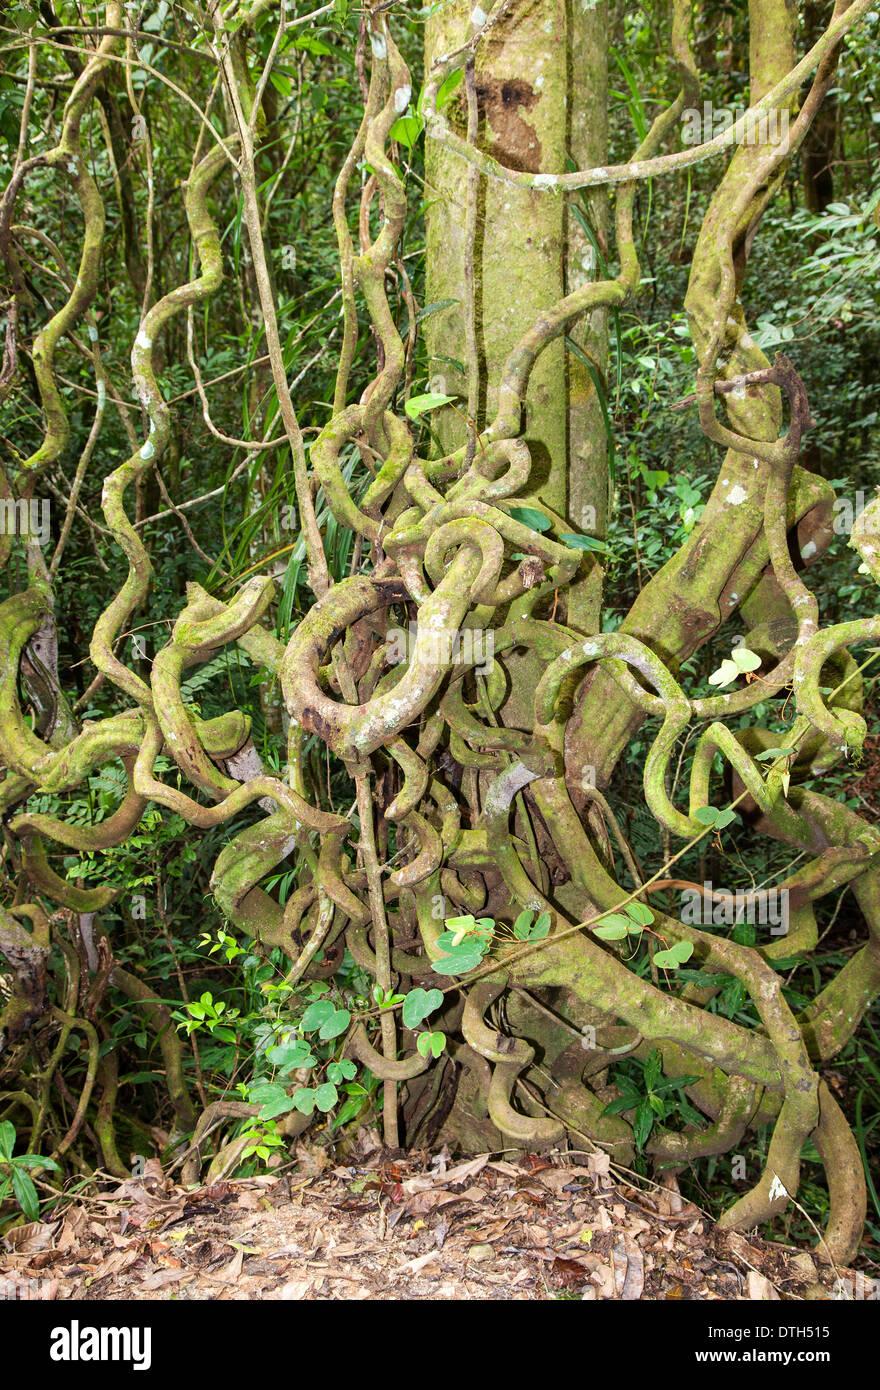 Crazy racines dans le Mont Kinabalu Park, Bornéo, Malaisie Photo Stock